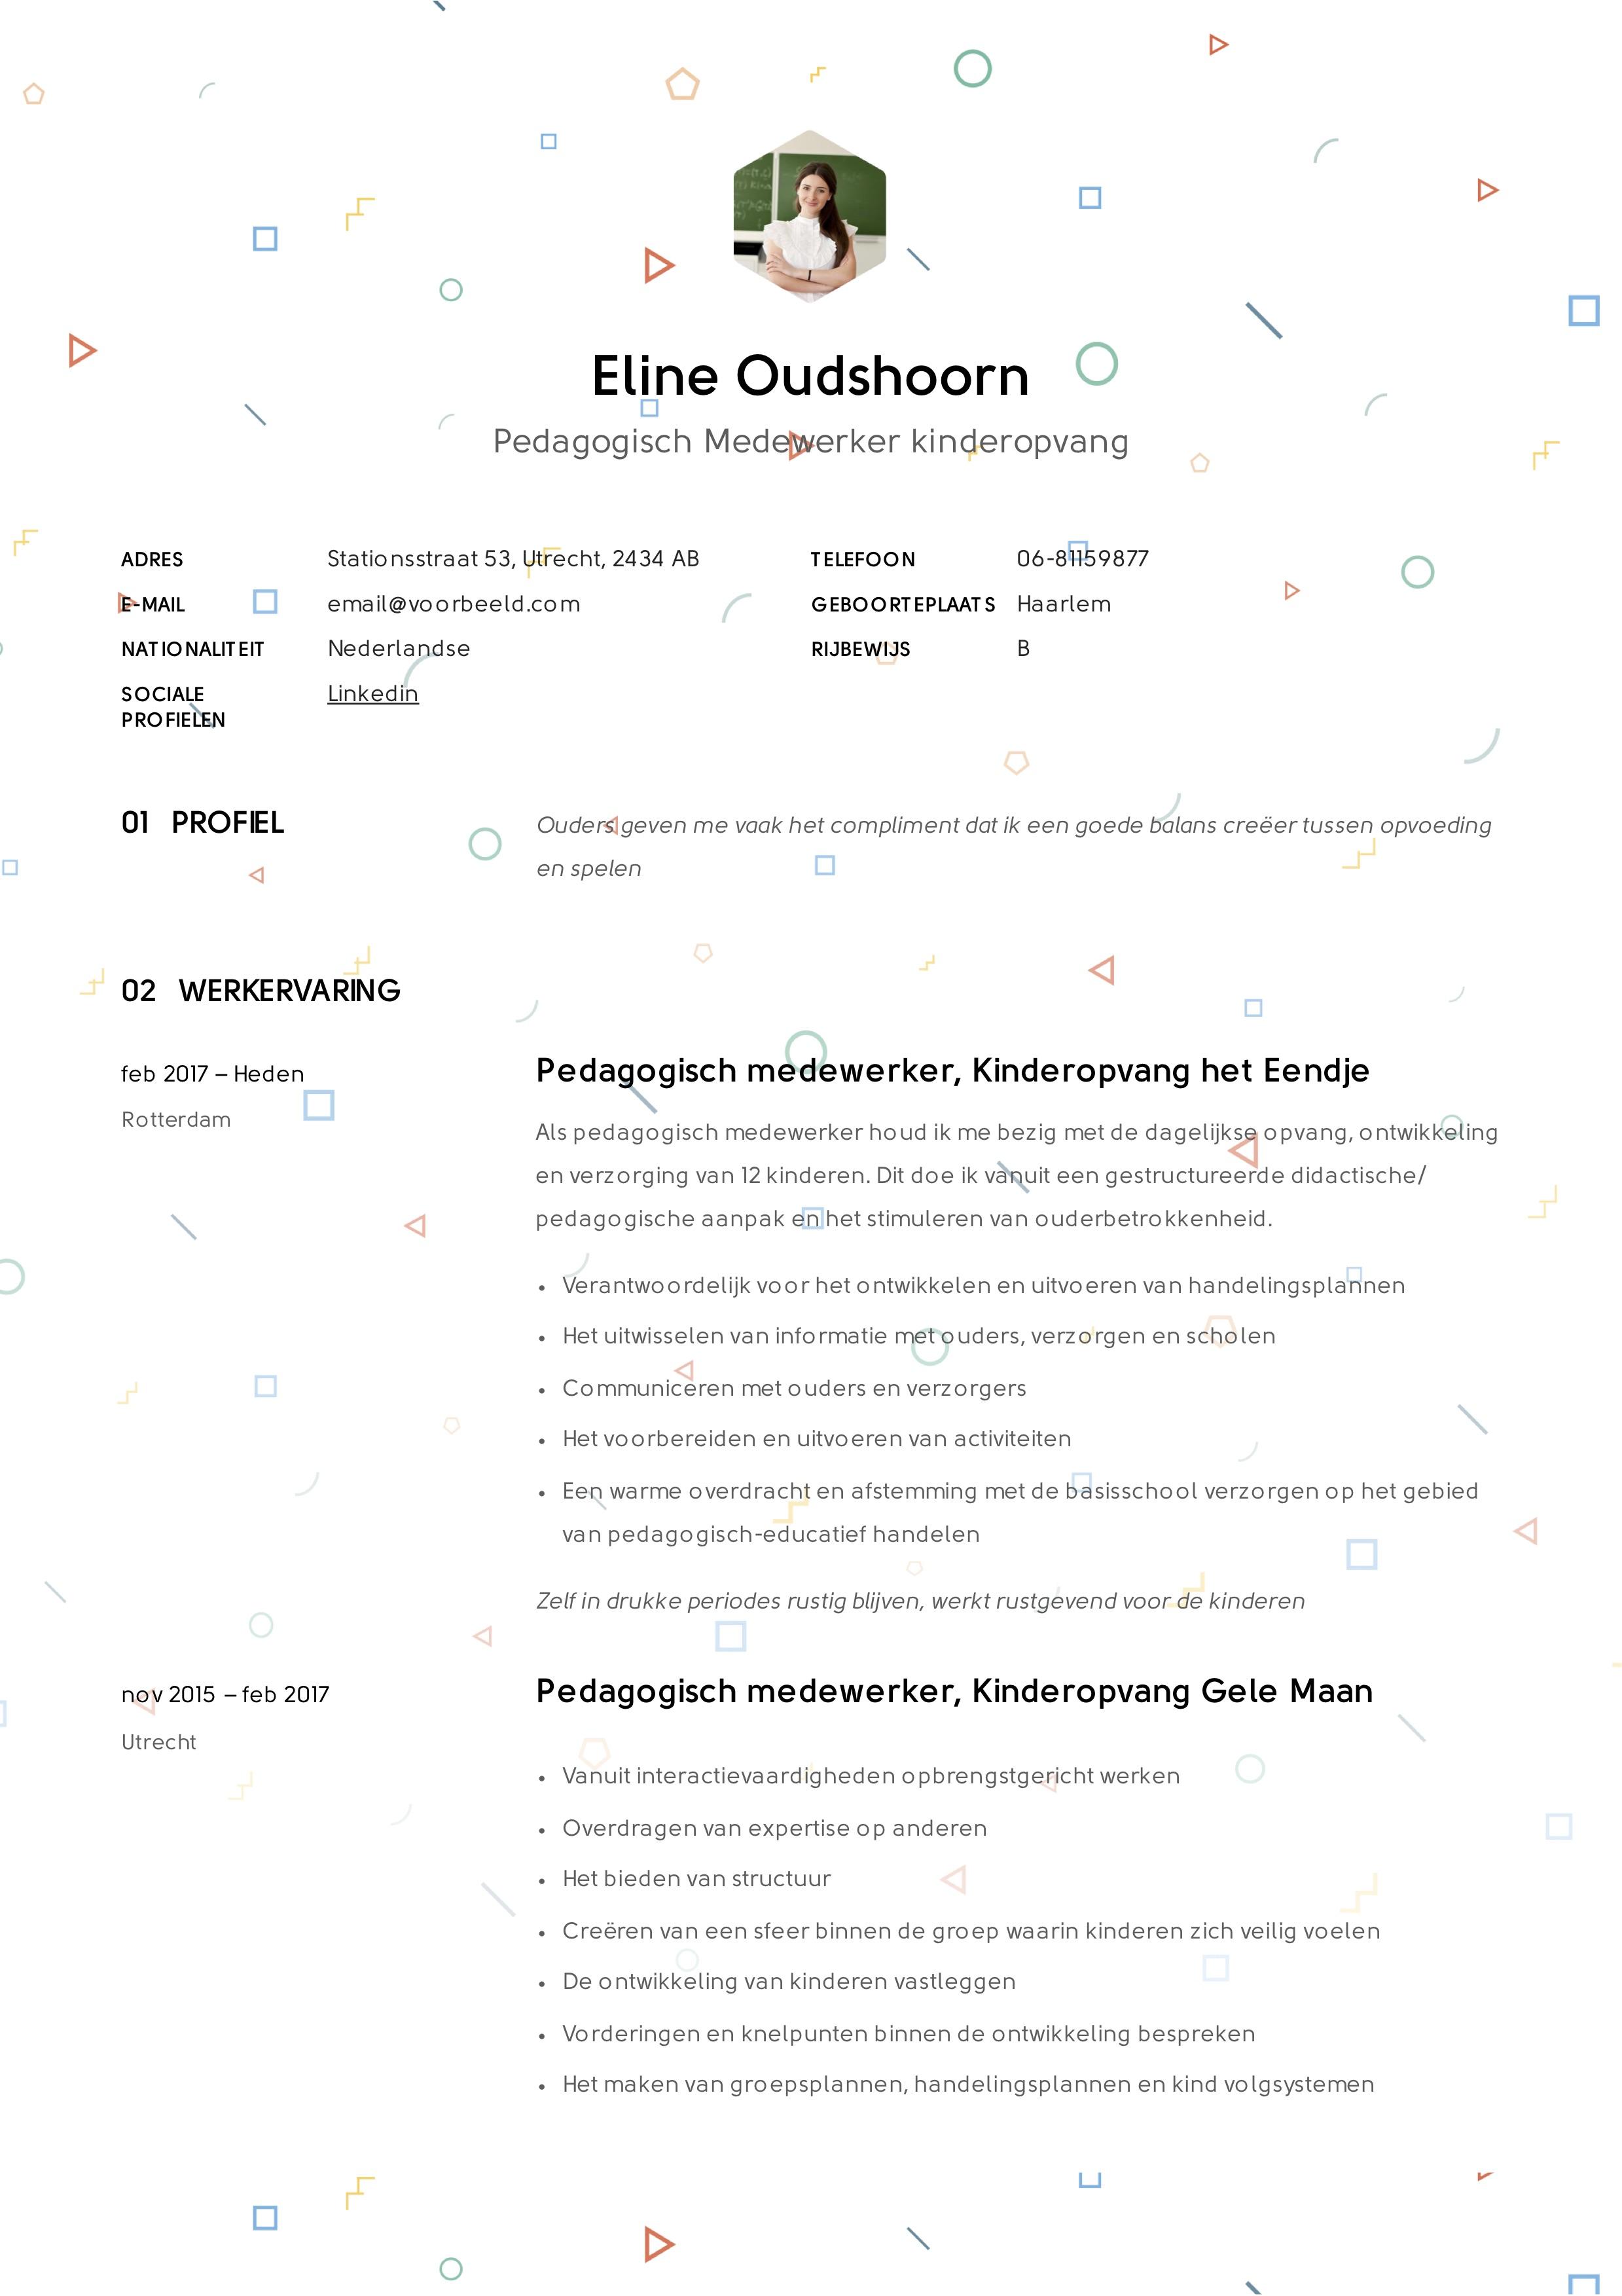 Eline_Oudshoorn_-_CV_-_Pedagogisch_Medewerker_kinderopvang (7)